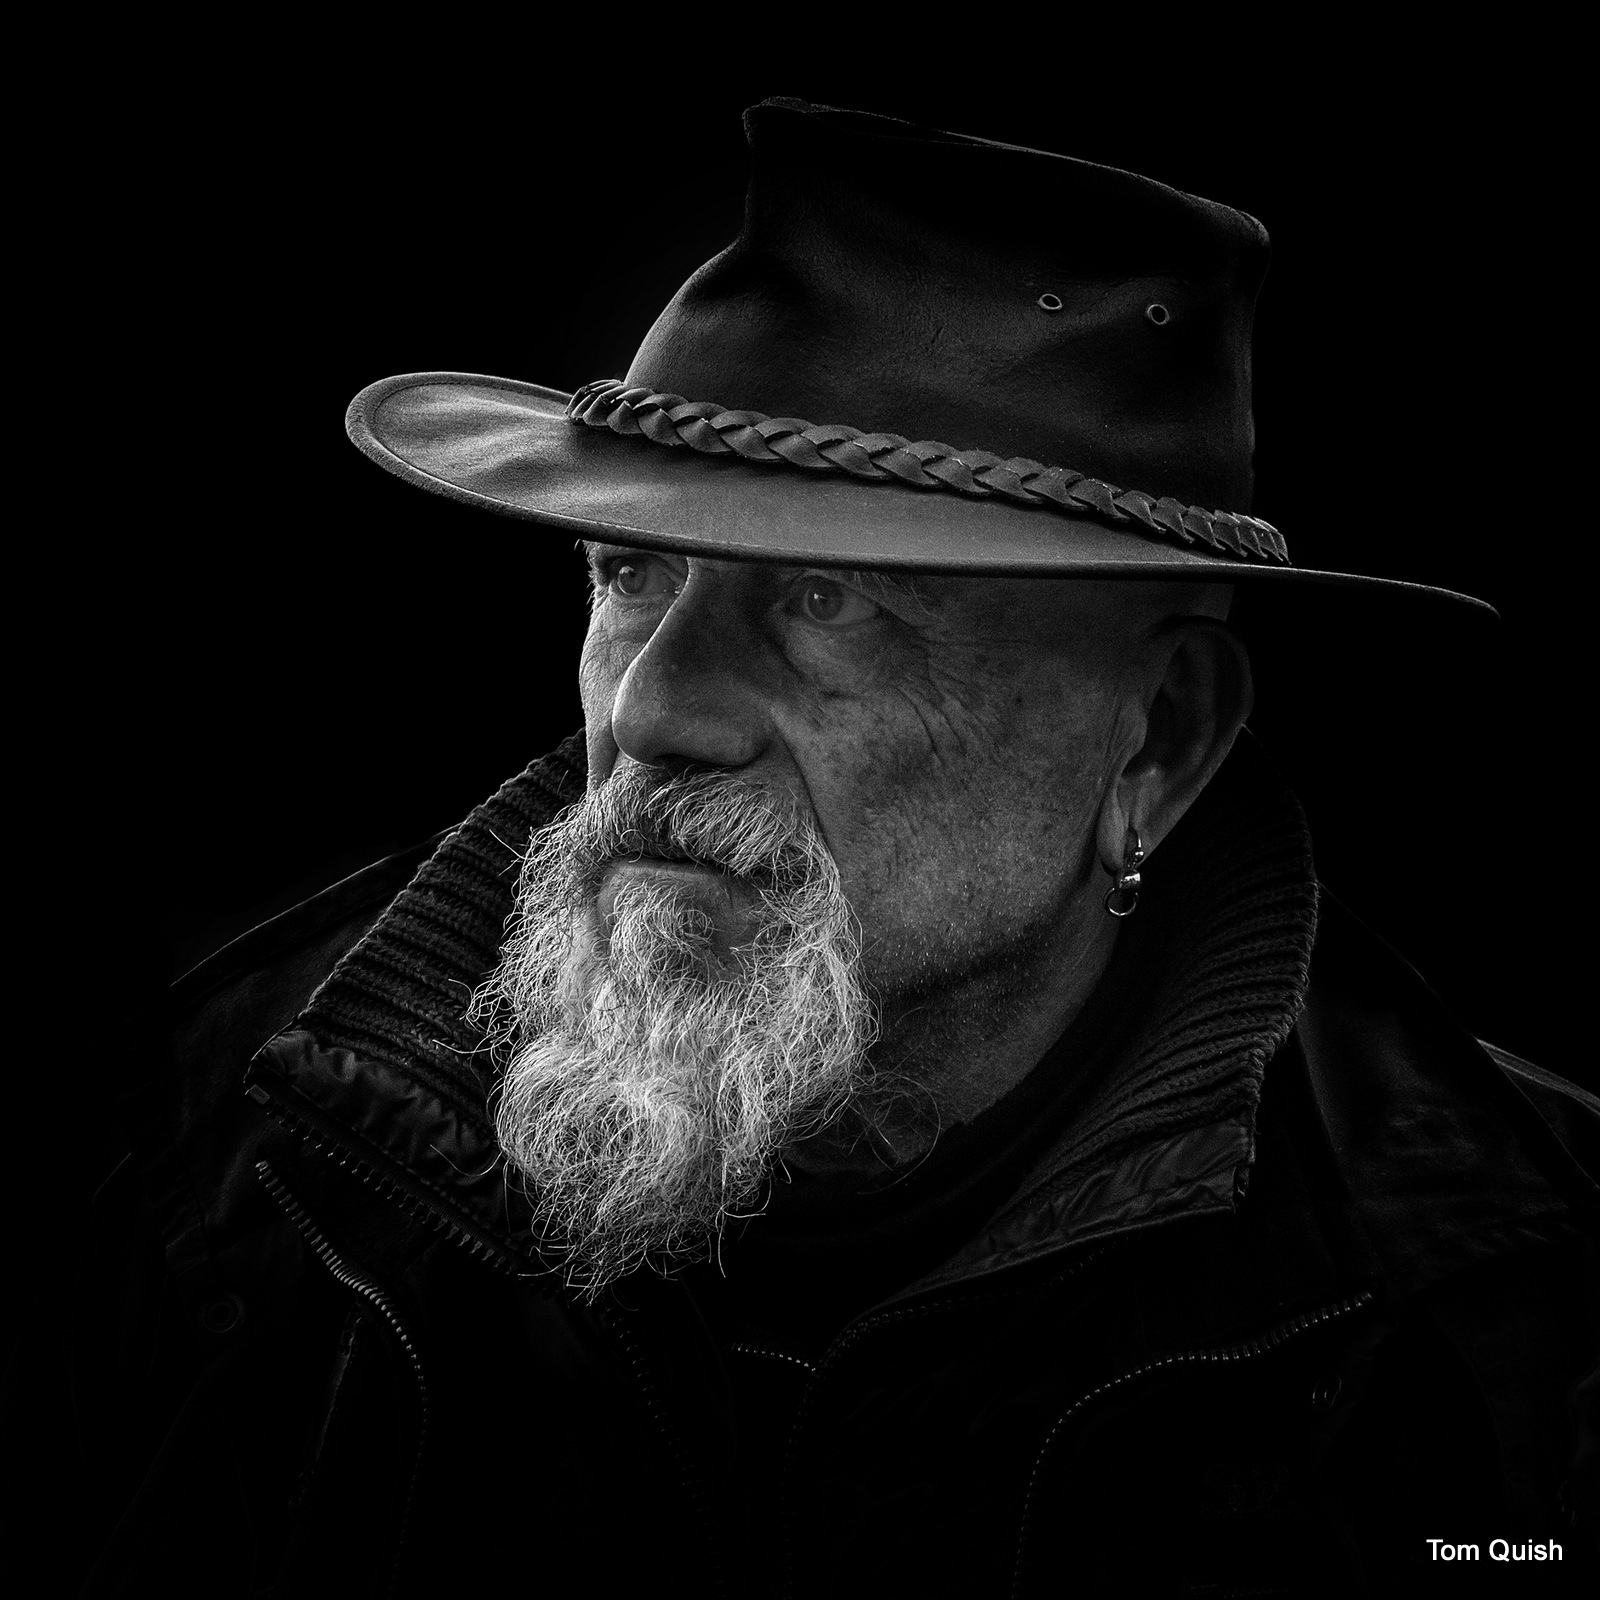 2nd overall – HUMAN PORTRAITURE - Tom Quish (George O'Keeffe)..jpg